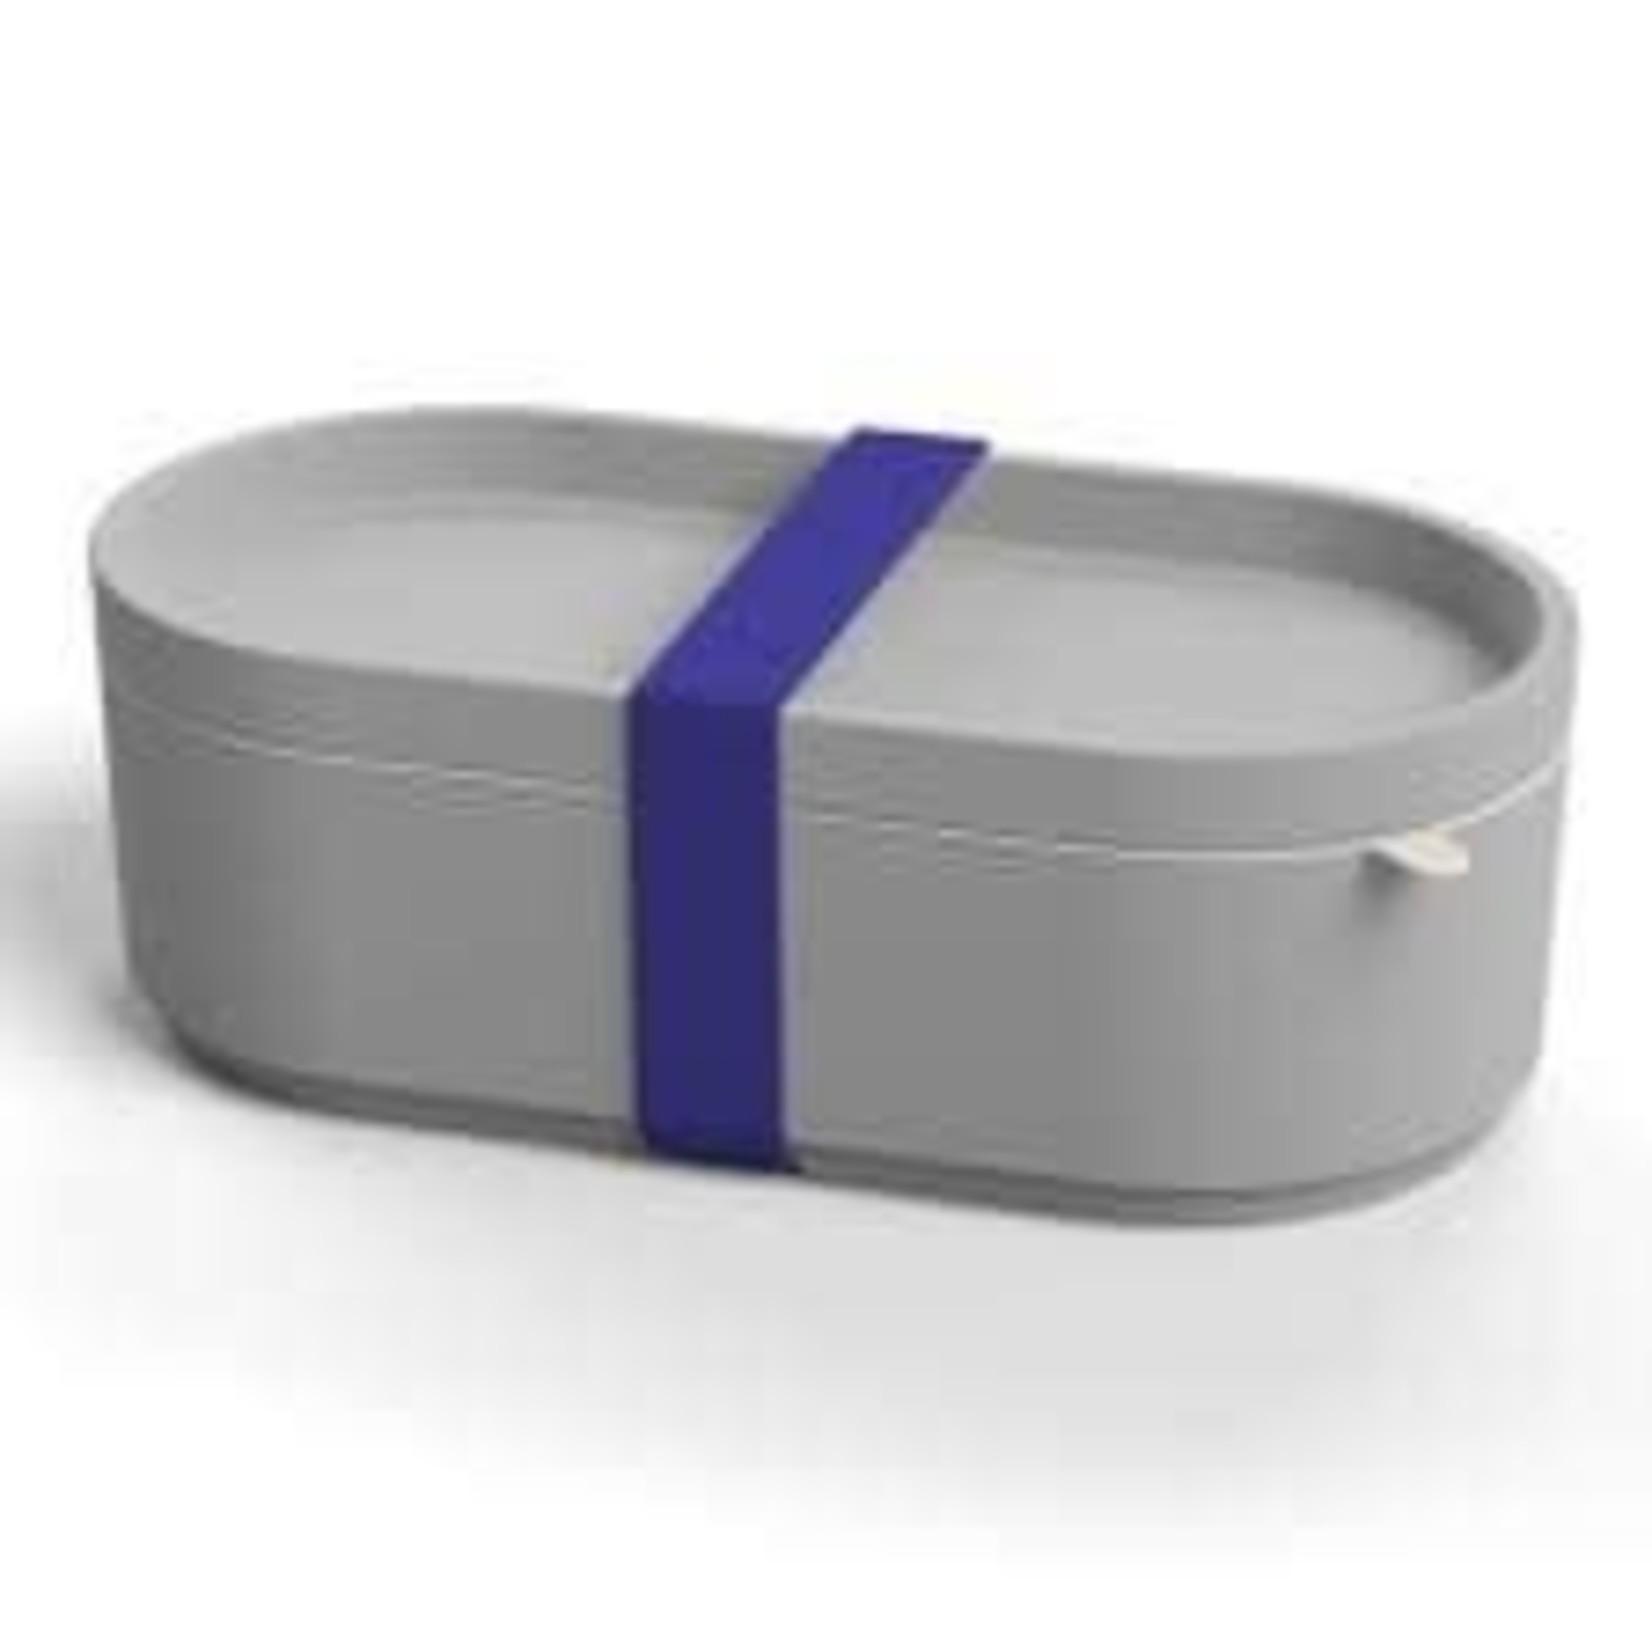 Lund Bento Box